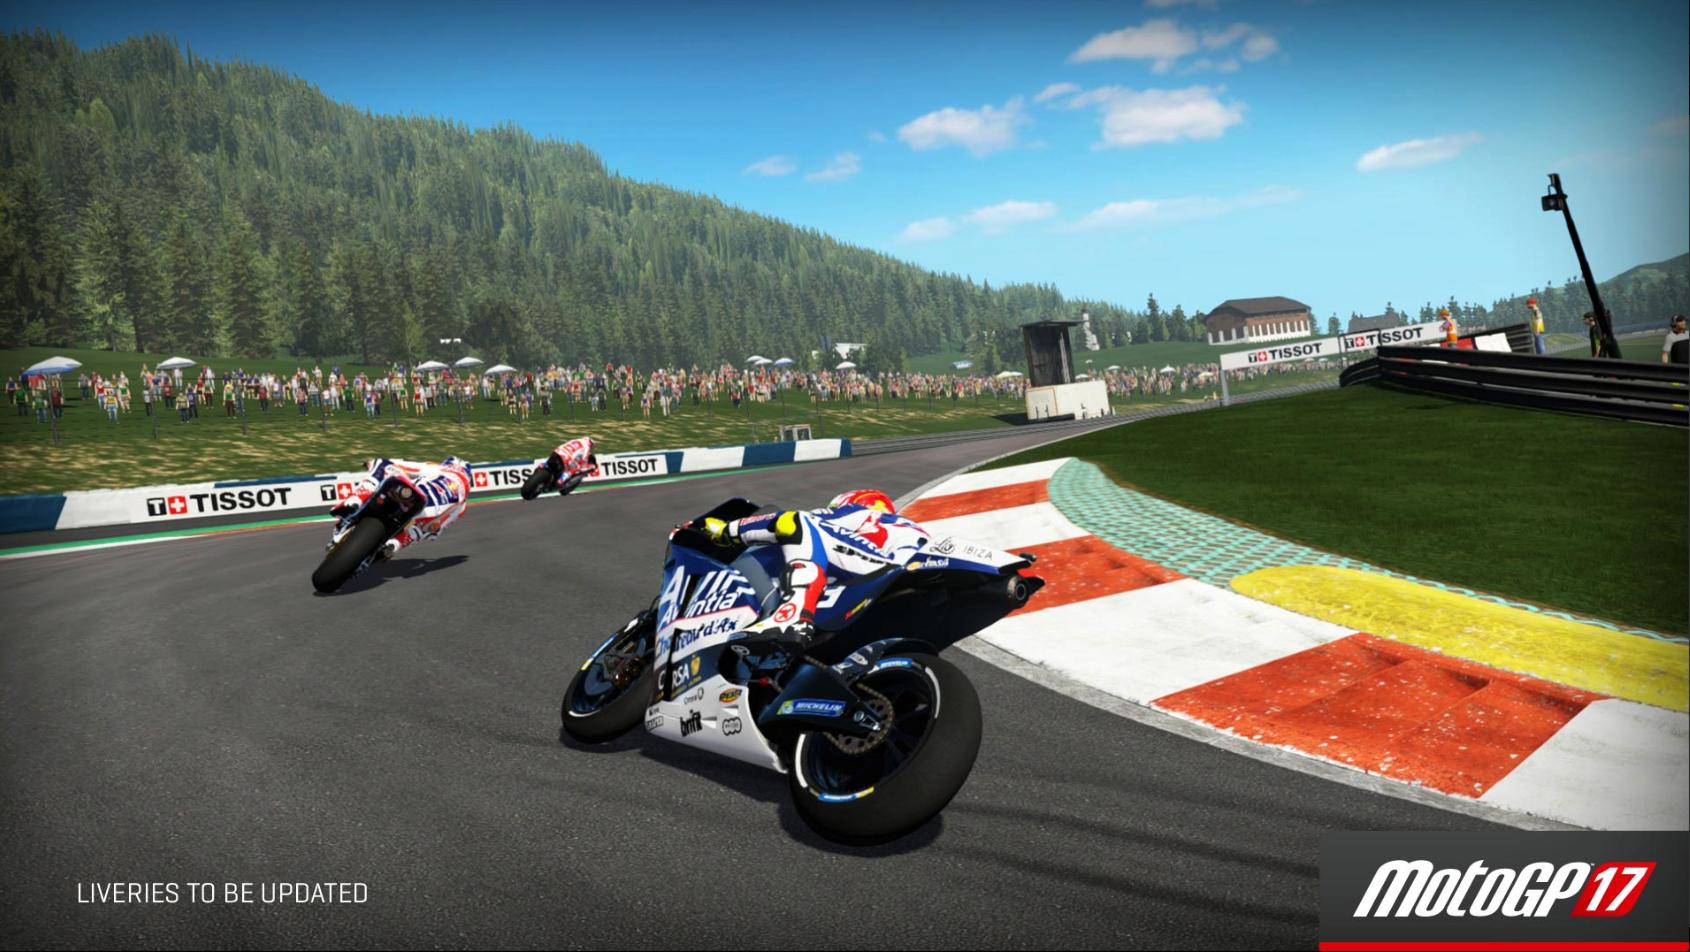 MotoGP 17 – Release Date Announced - Inside Sim Racing